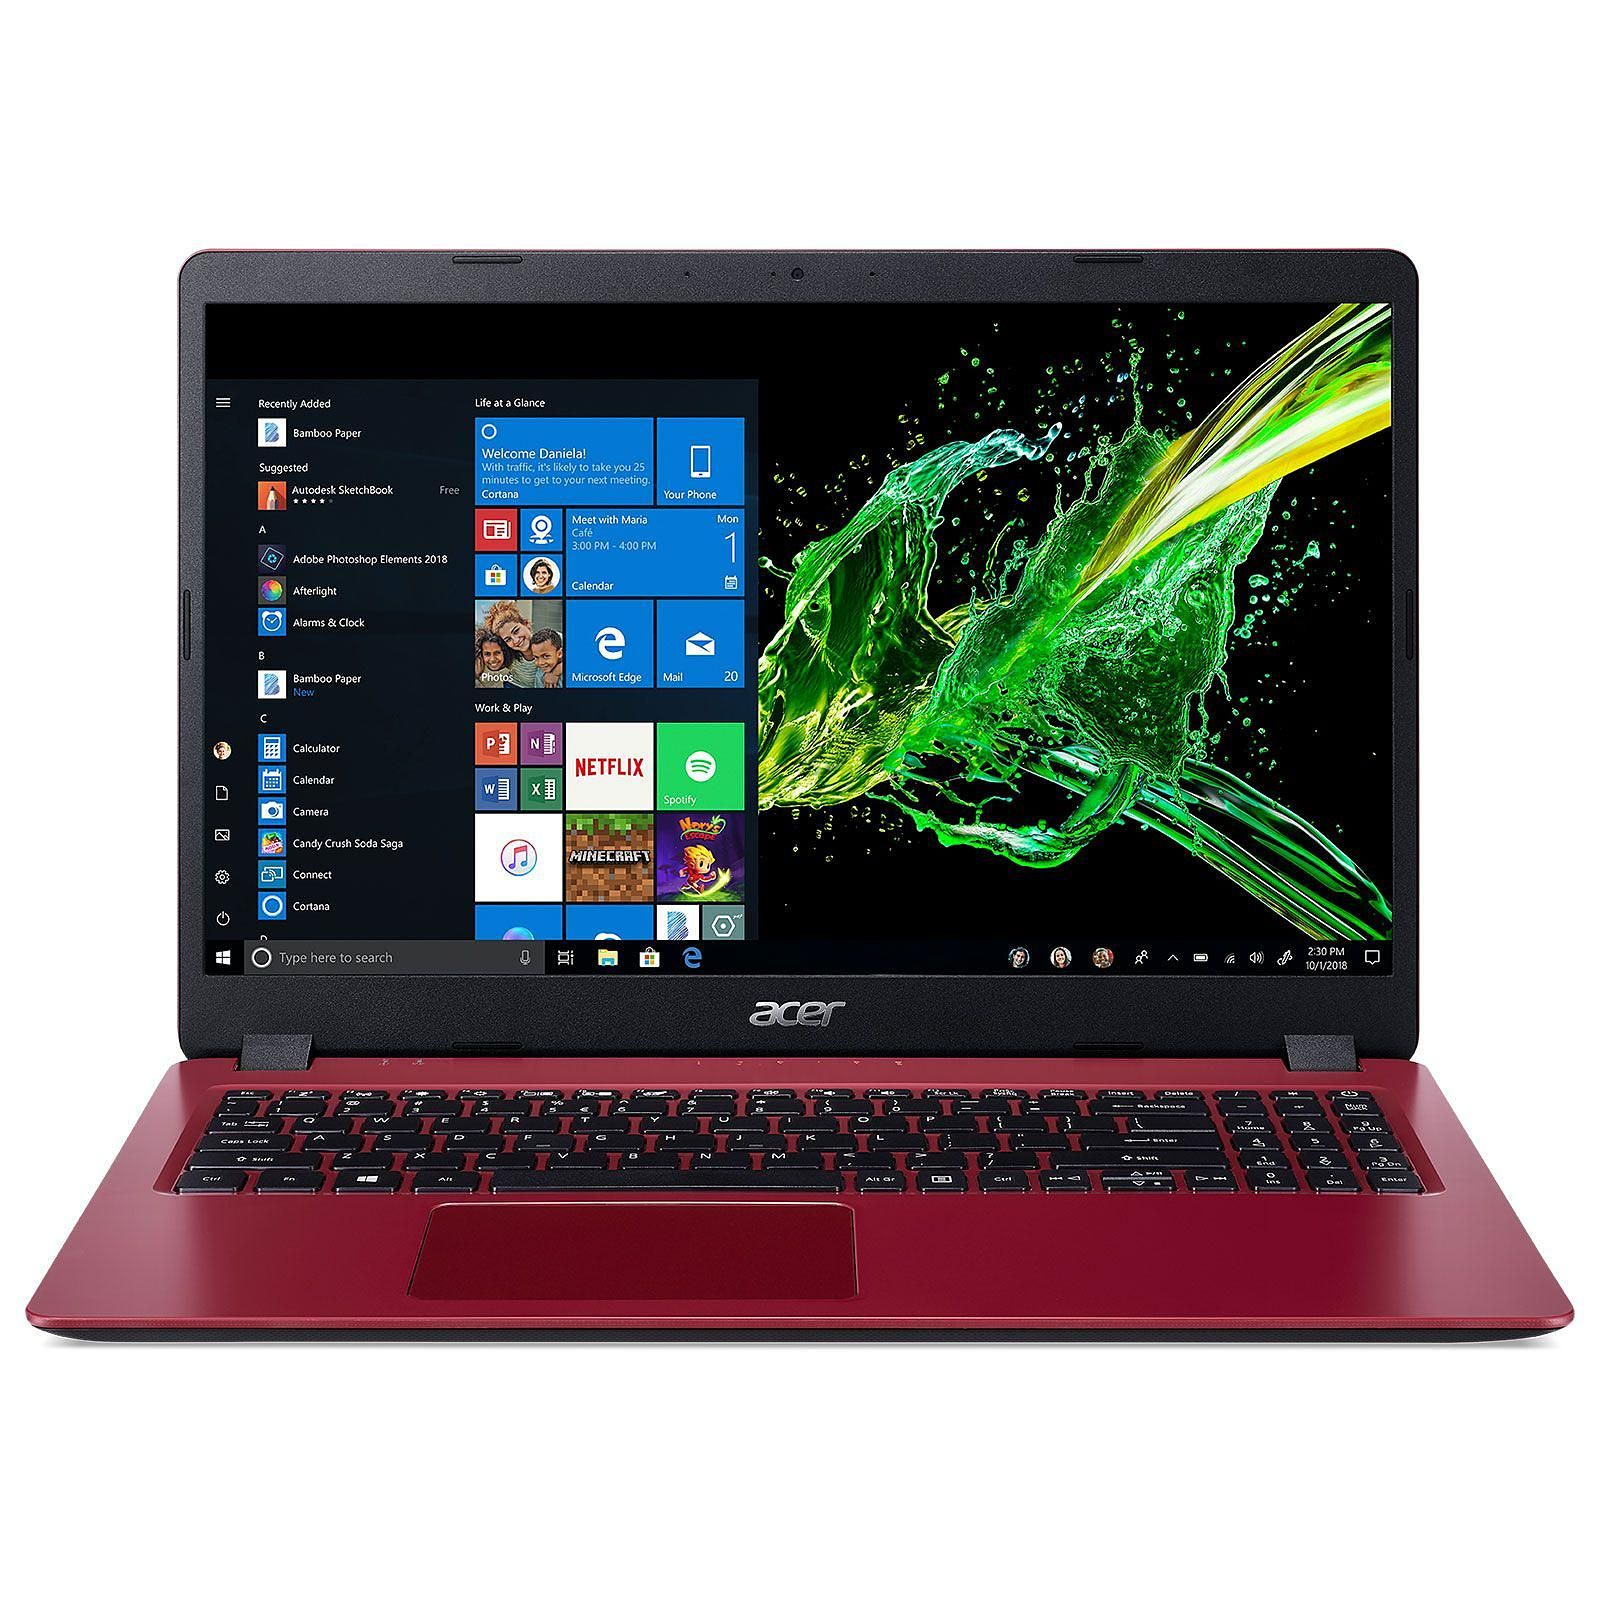 Acer NX.HS7EF.004 - PC portable Acer - Cybertek.fr - 4